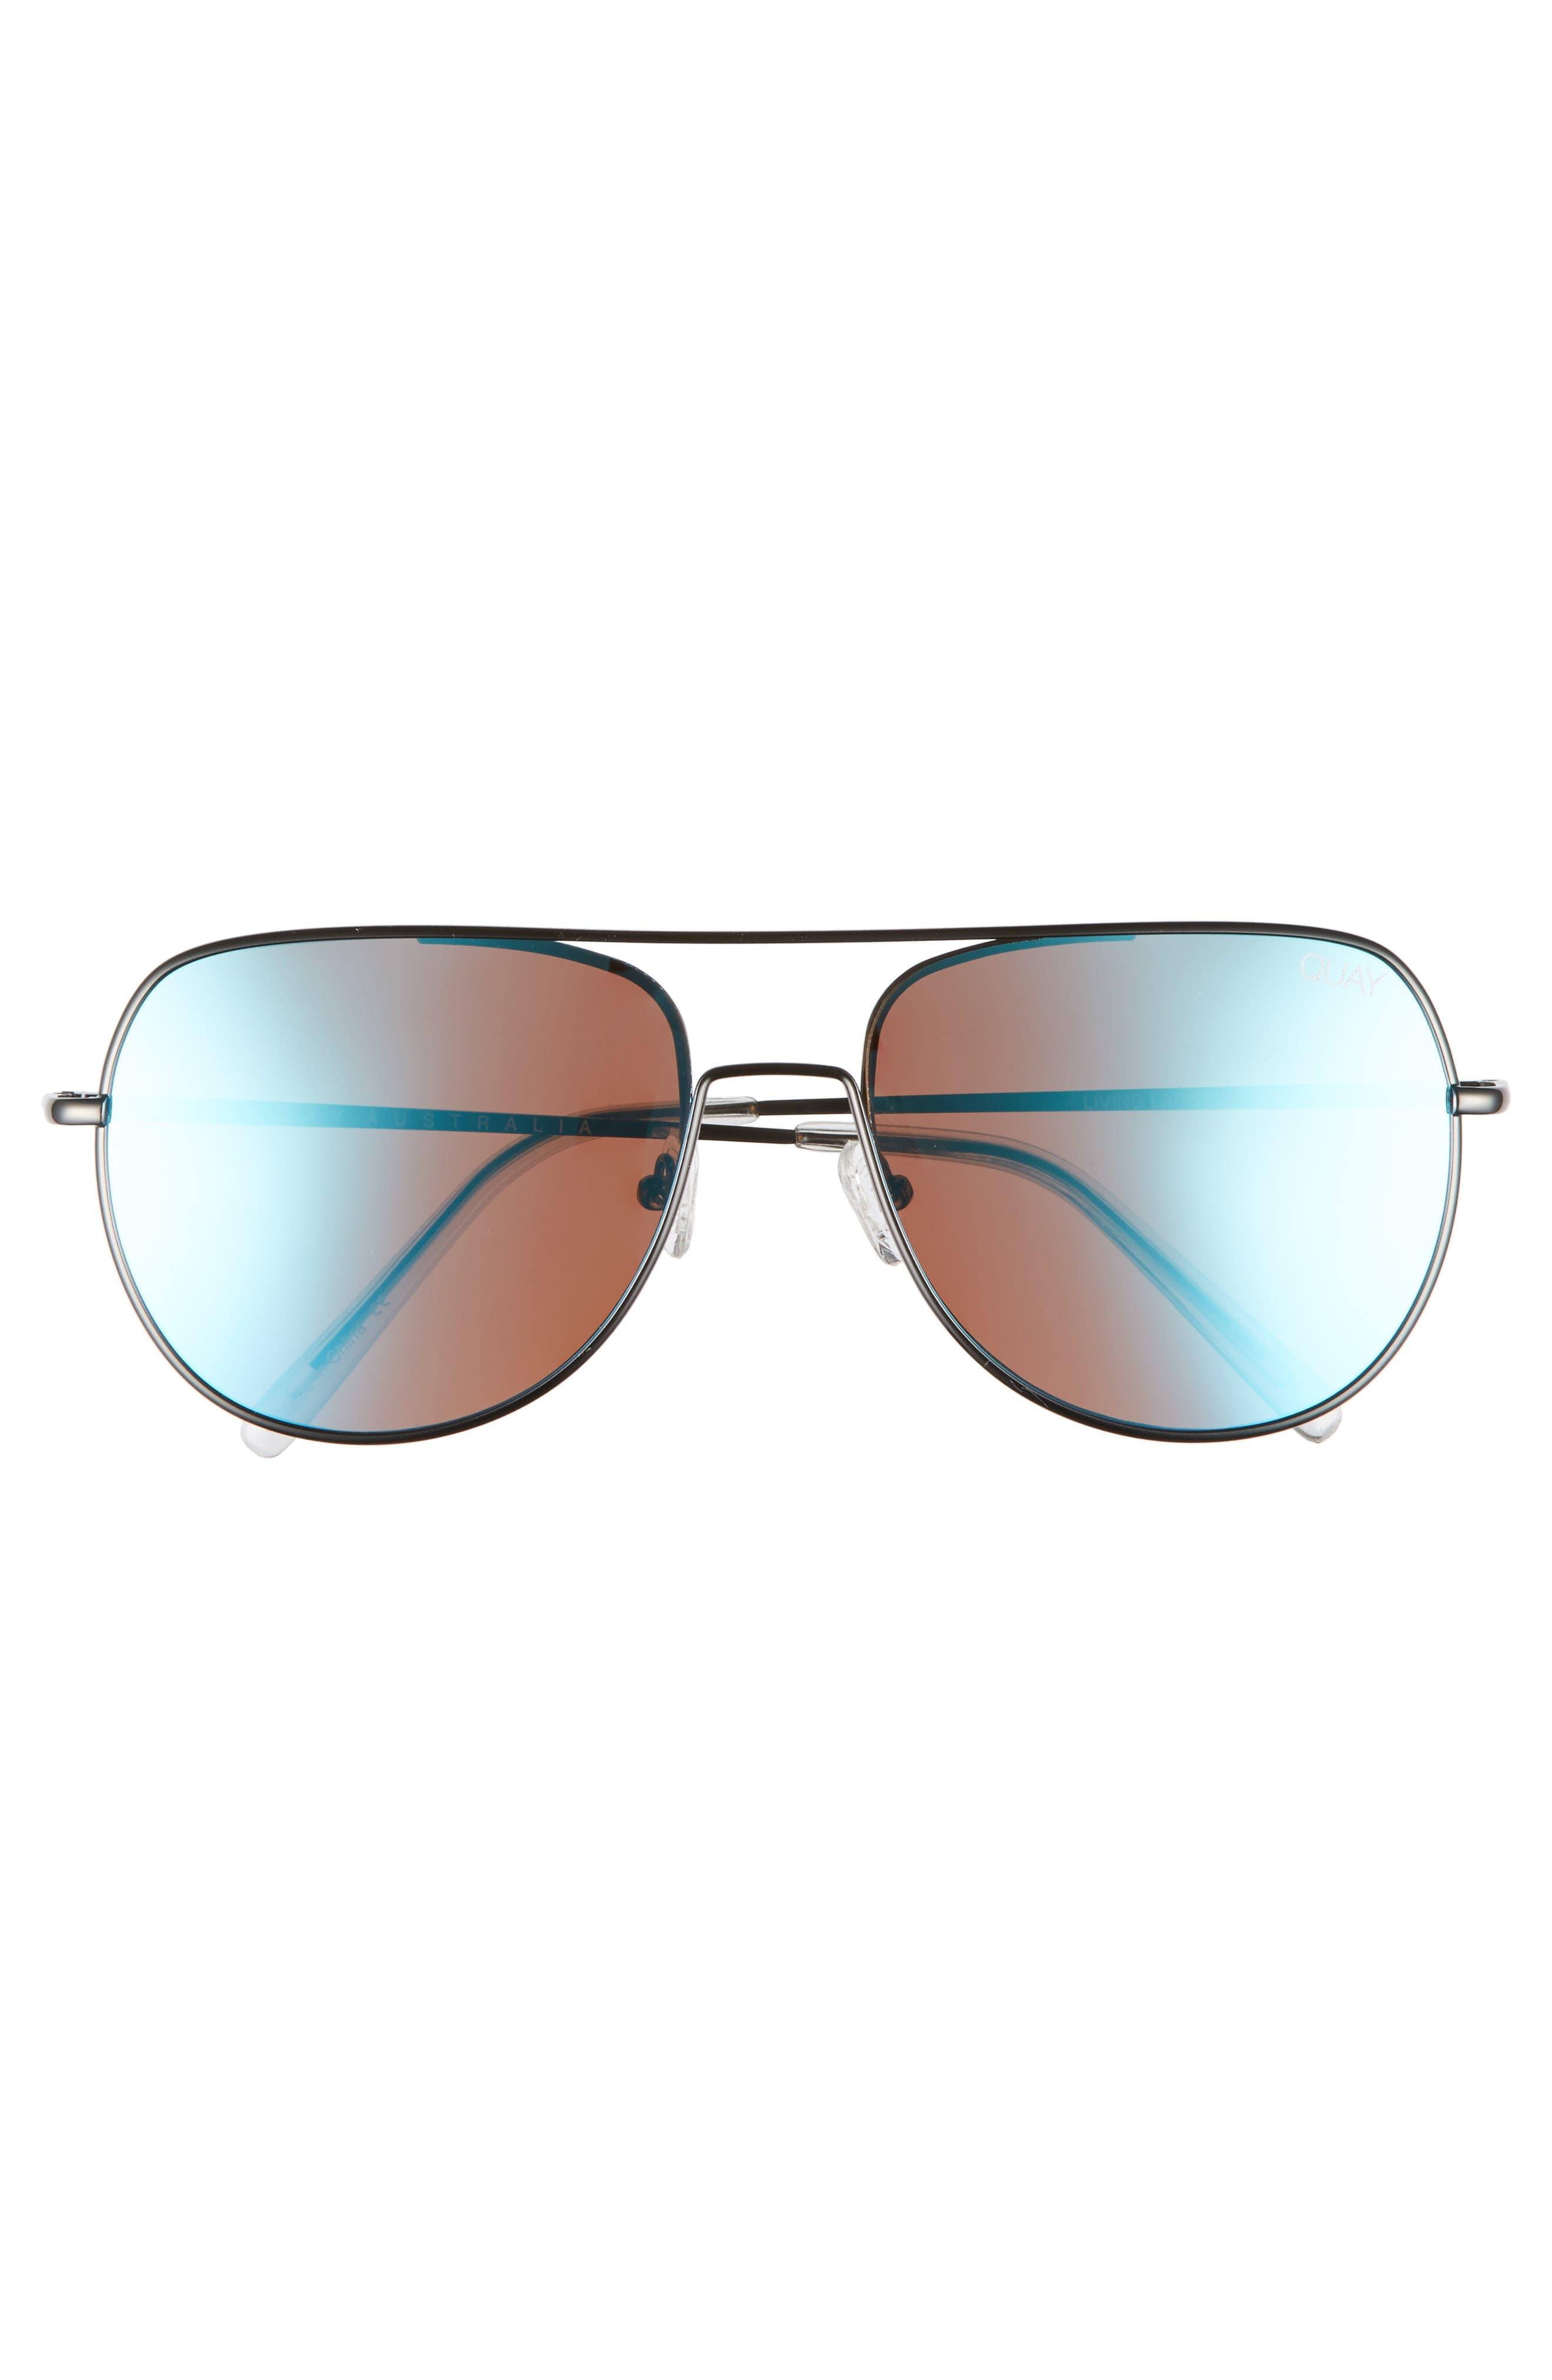 Living Large 58mm Aviator Sunglasses,                             Alternate thumbnail 2, color,                             DARK GREY/BLUE